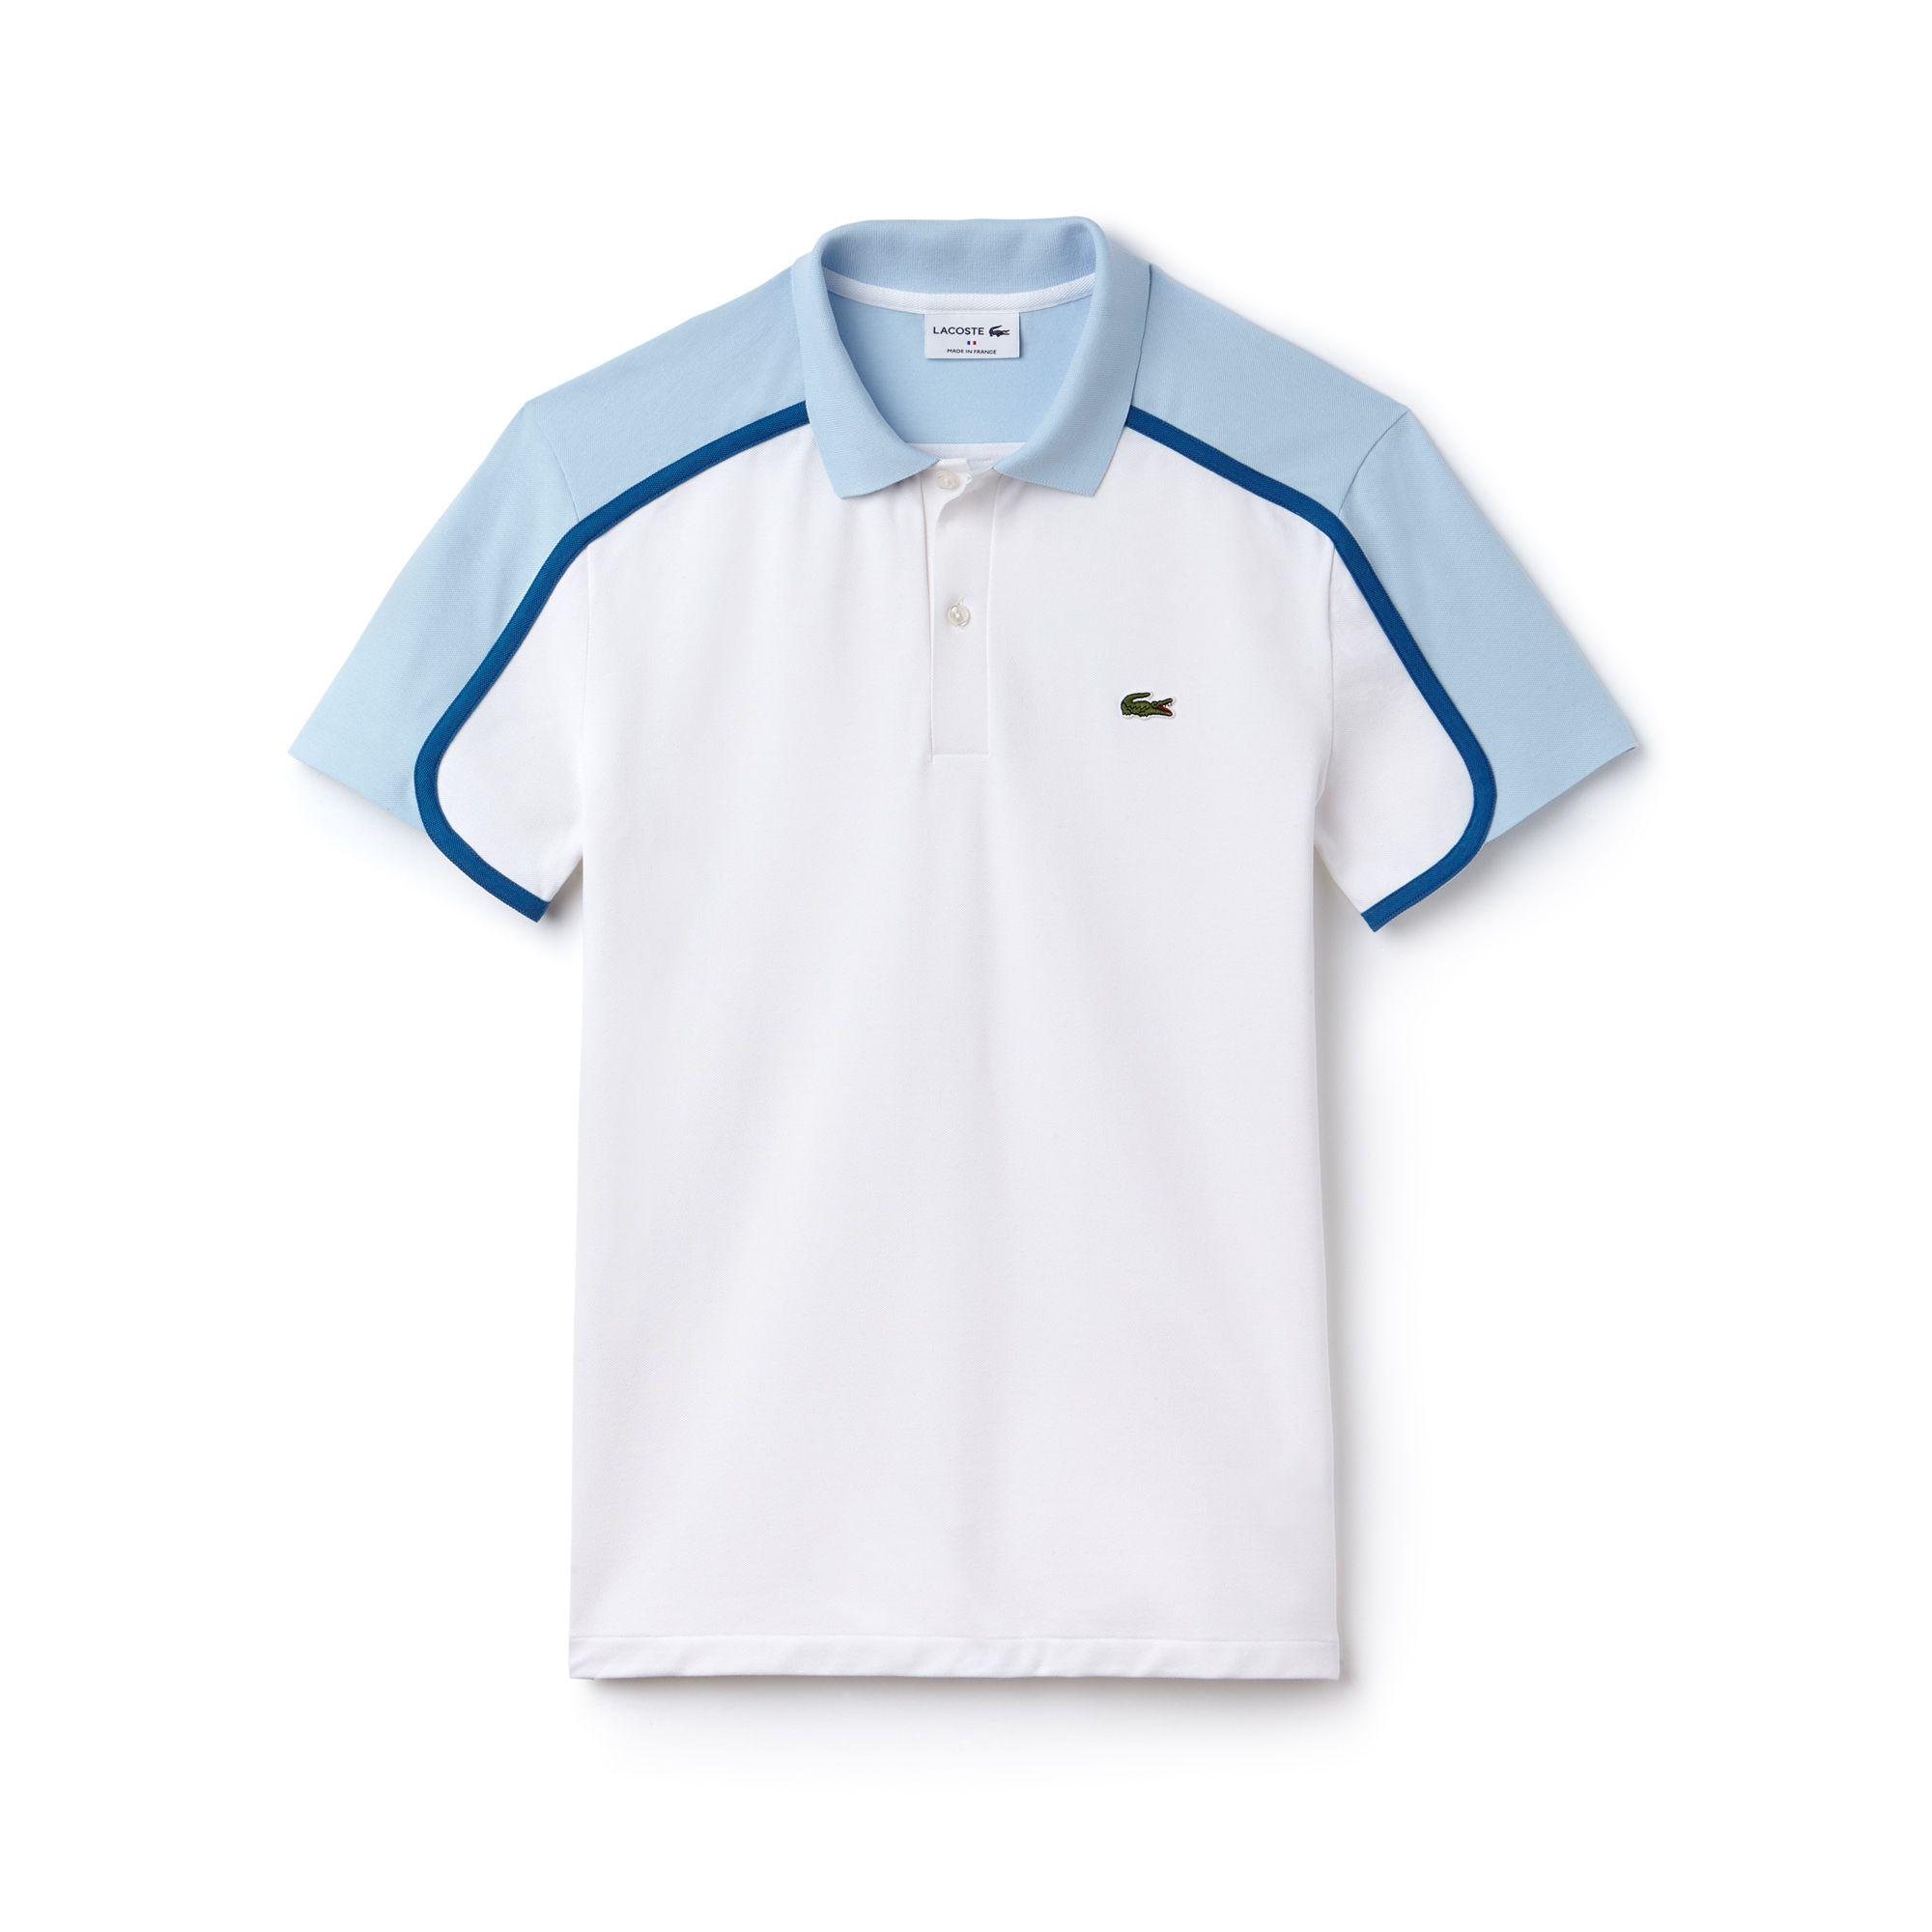 38c55a3b0cc61 Pin by Tiago on Shirts